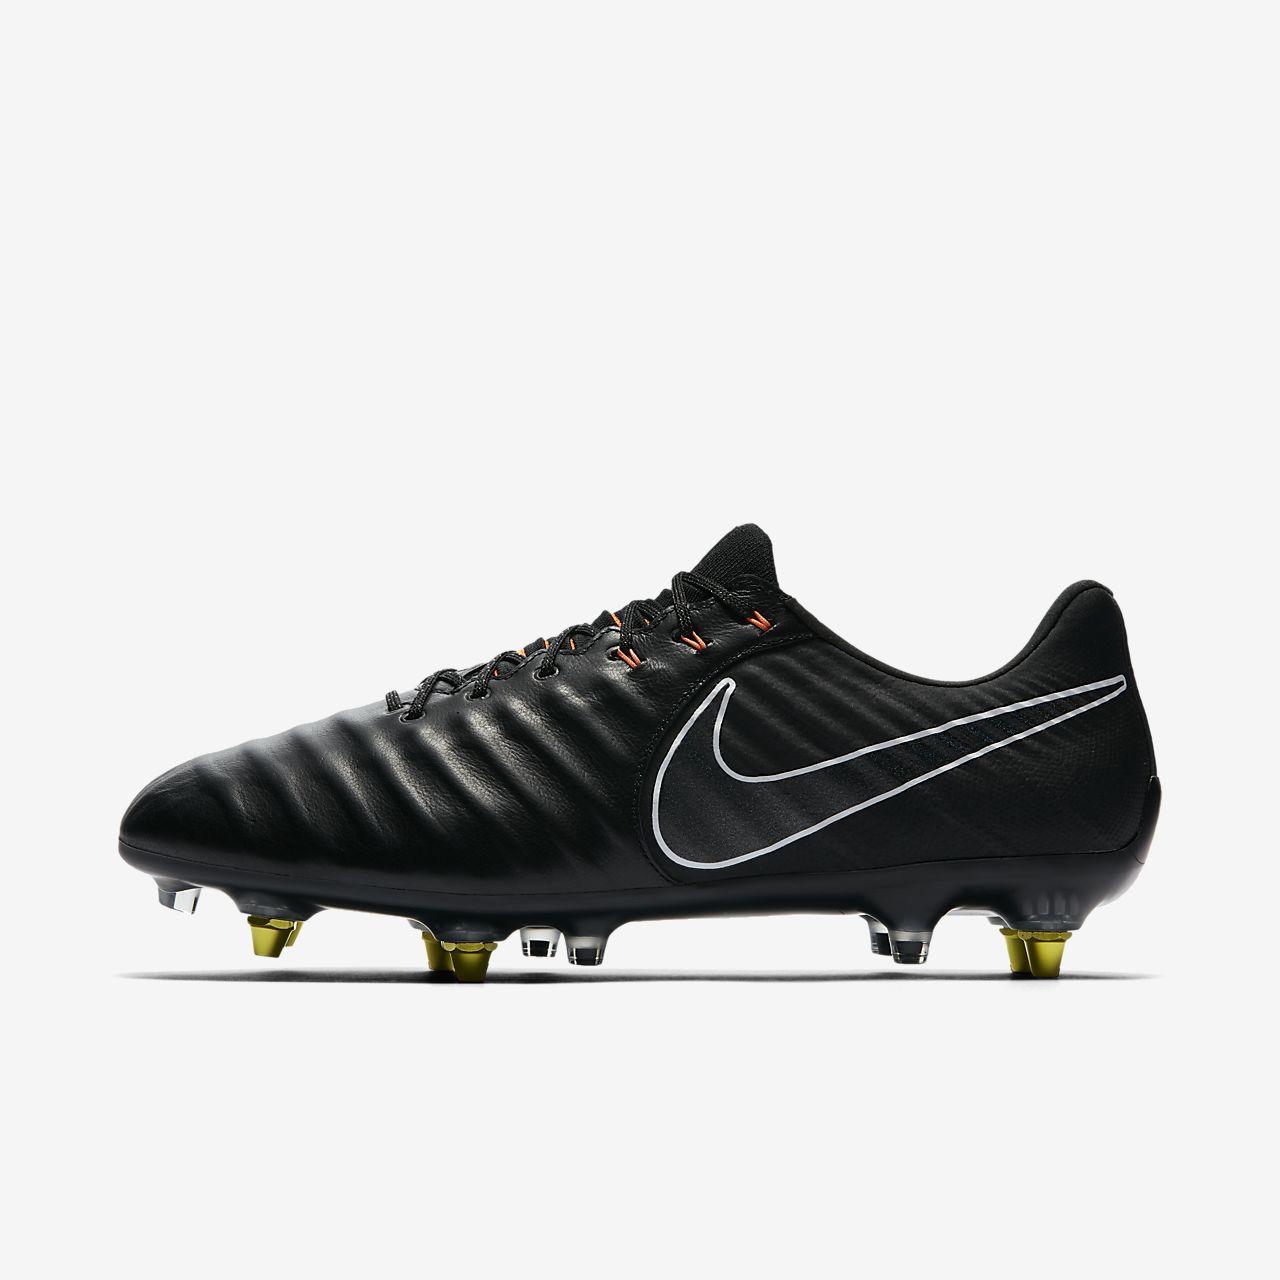 Men's Nike Premier II Anti-Clog Traction SG-PRO Black/Black/Black